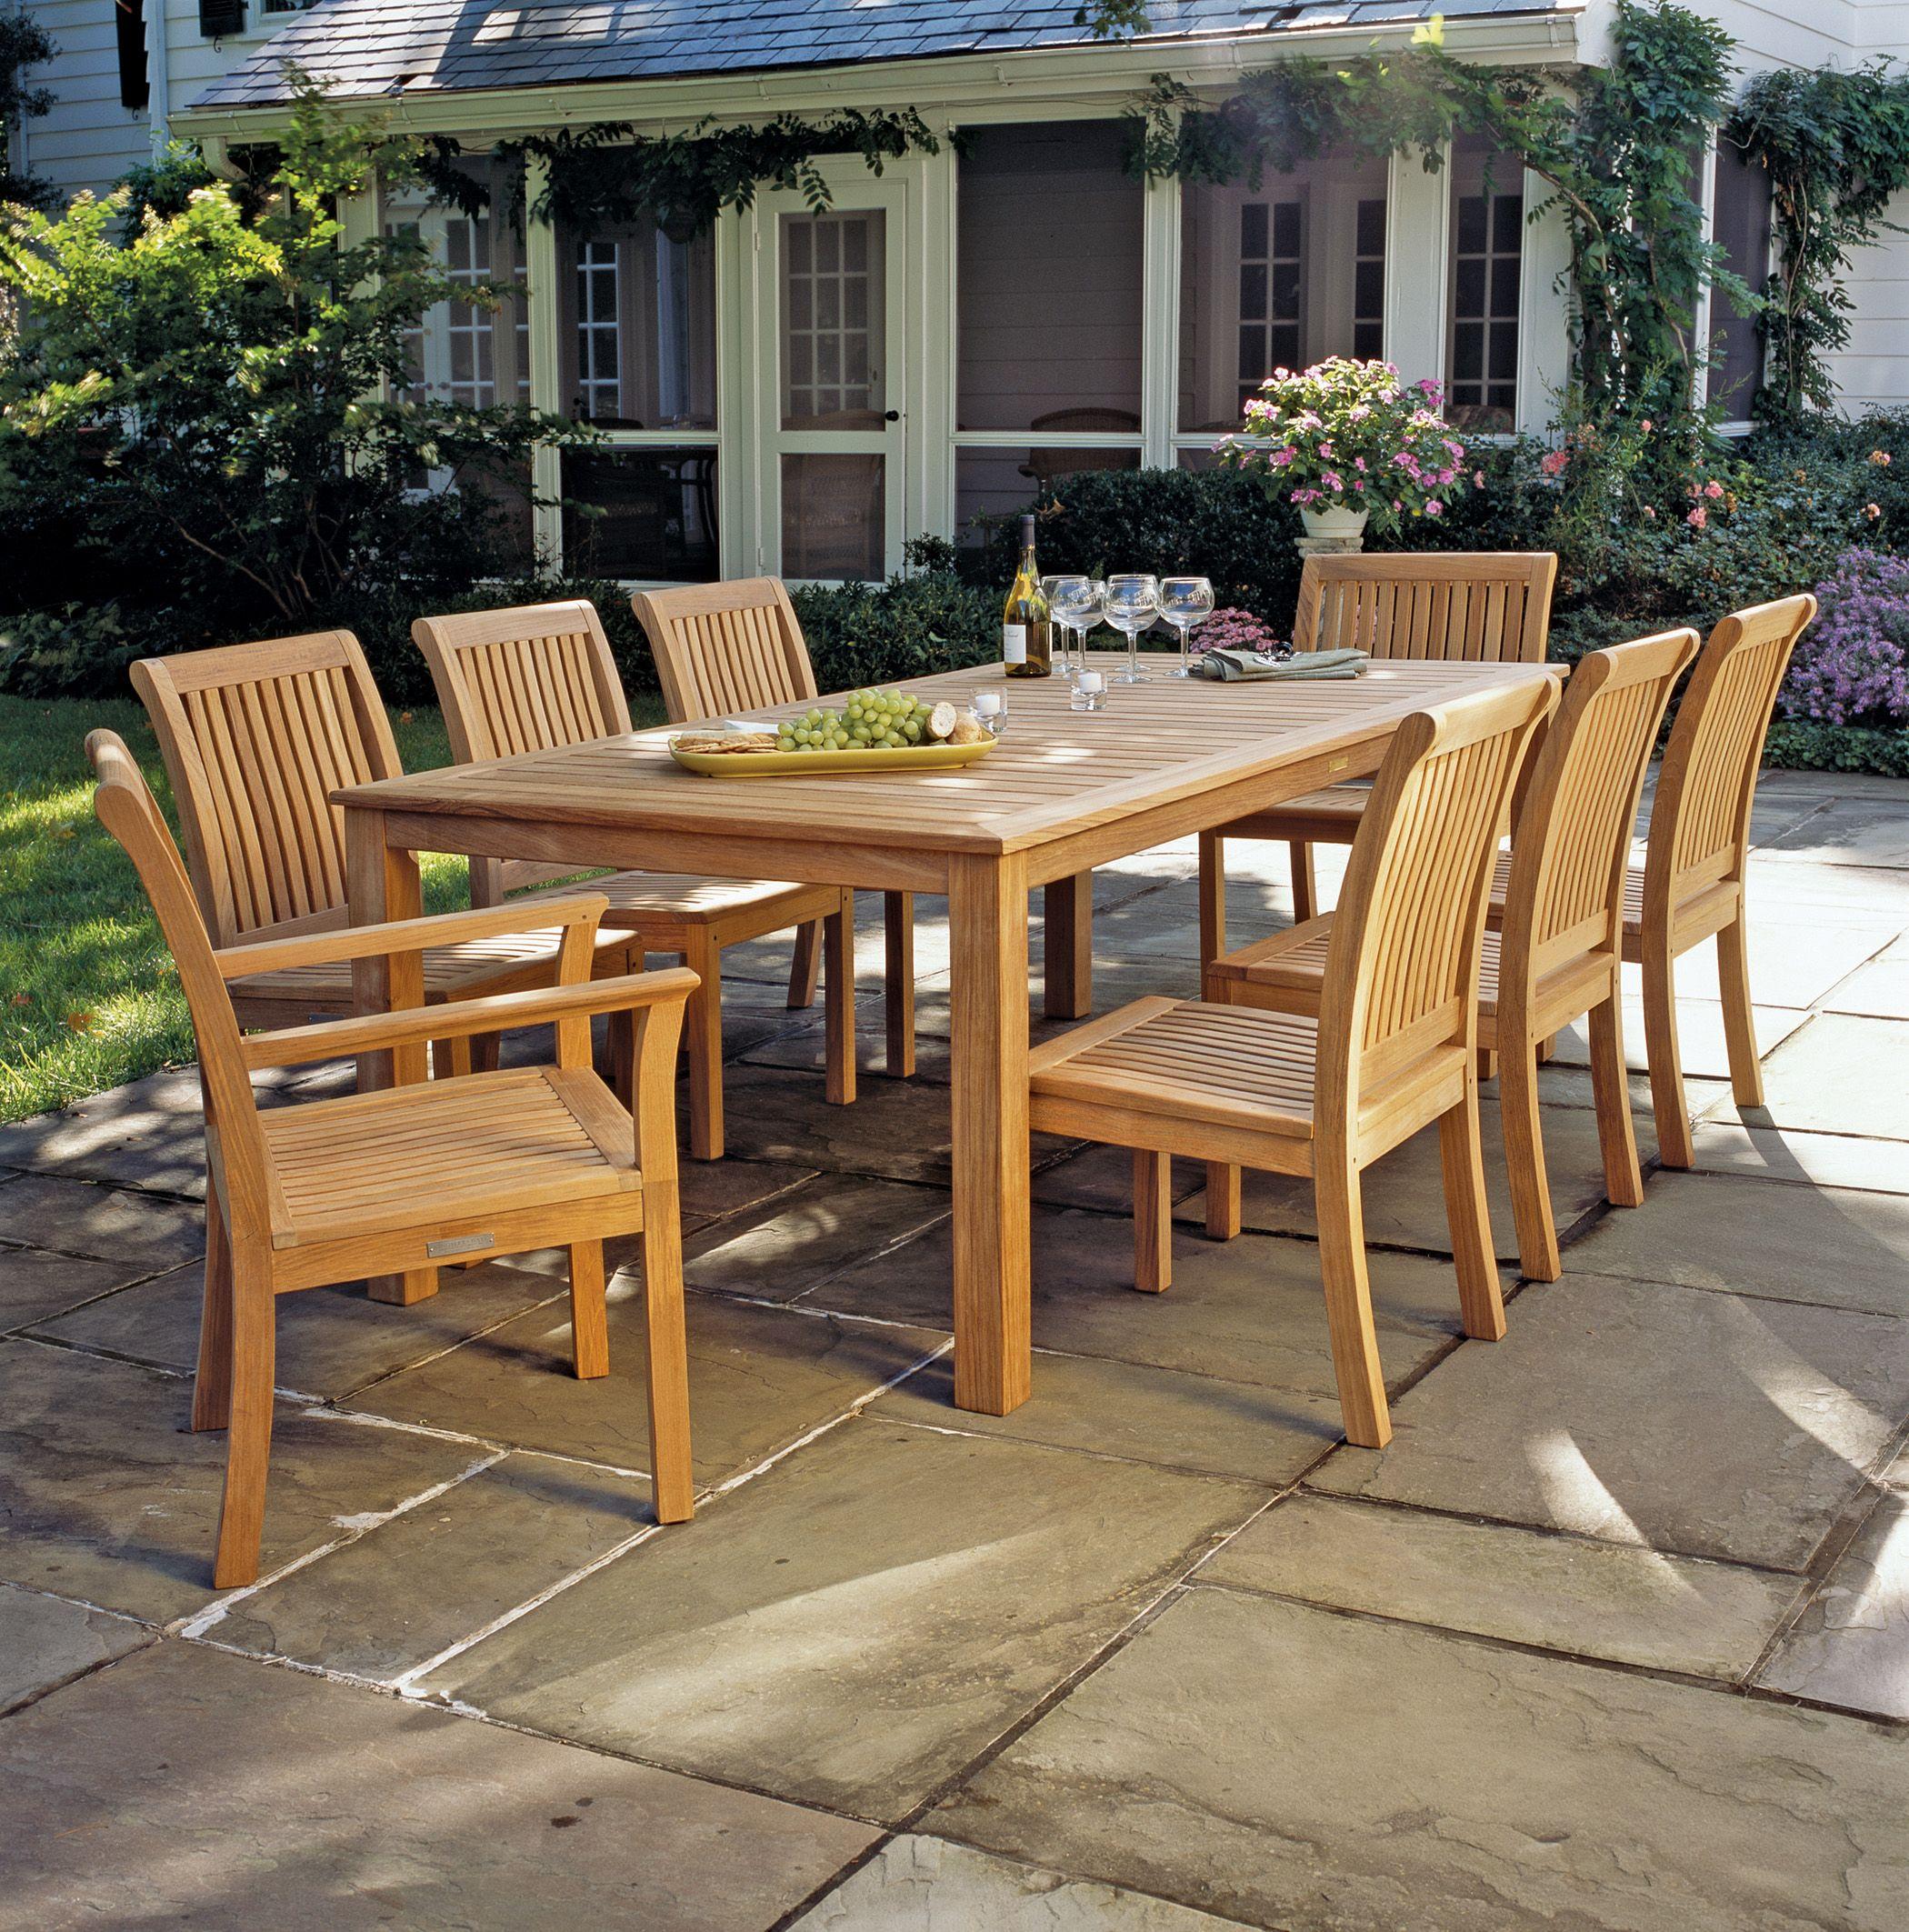 Kingsley Bate Chelsea Dining Set [Cheslea Chairs And Wainscott Table]   Teak  Furniture